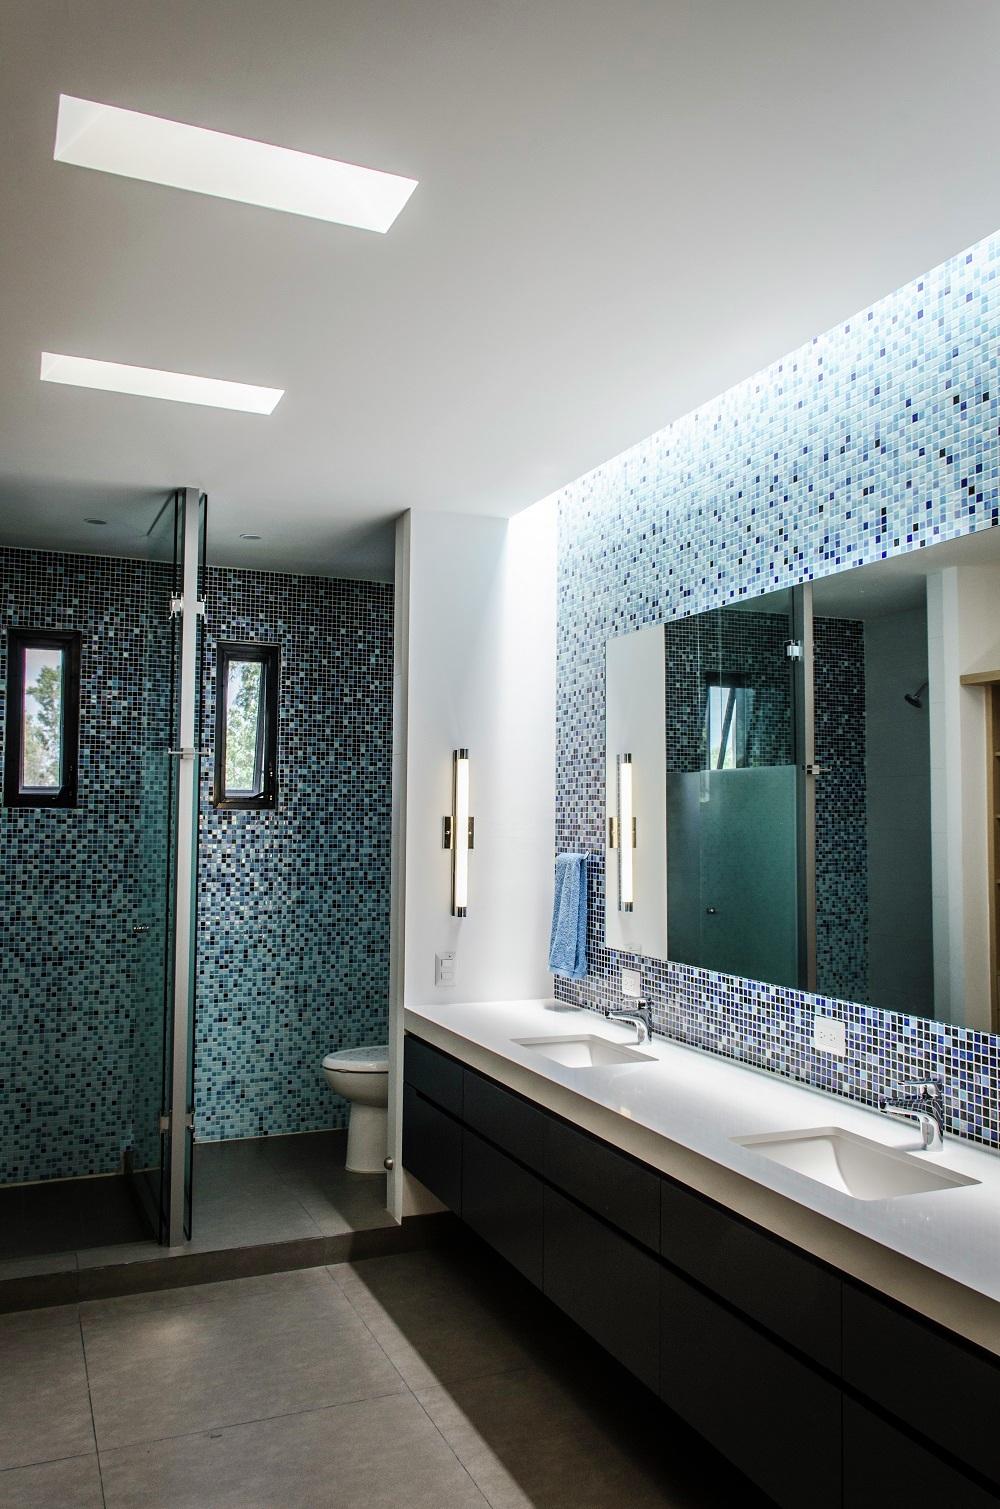 Galer a de casa b g adi arquitectura y dise o interior 9 for Arquitectura y diseno interior